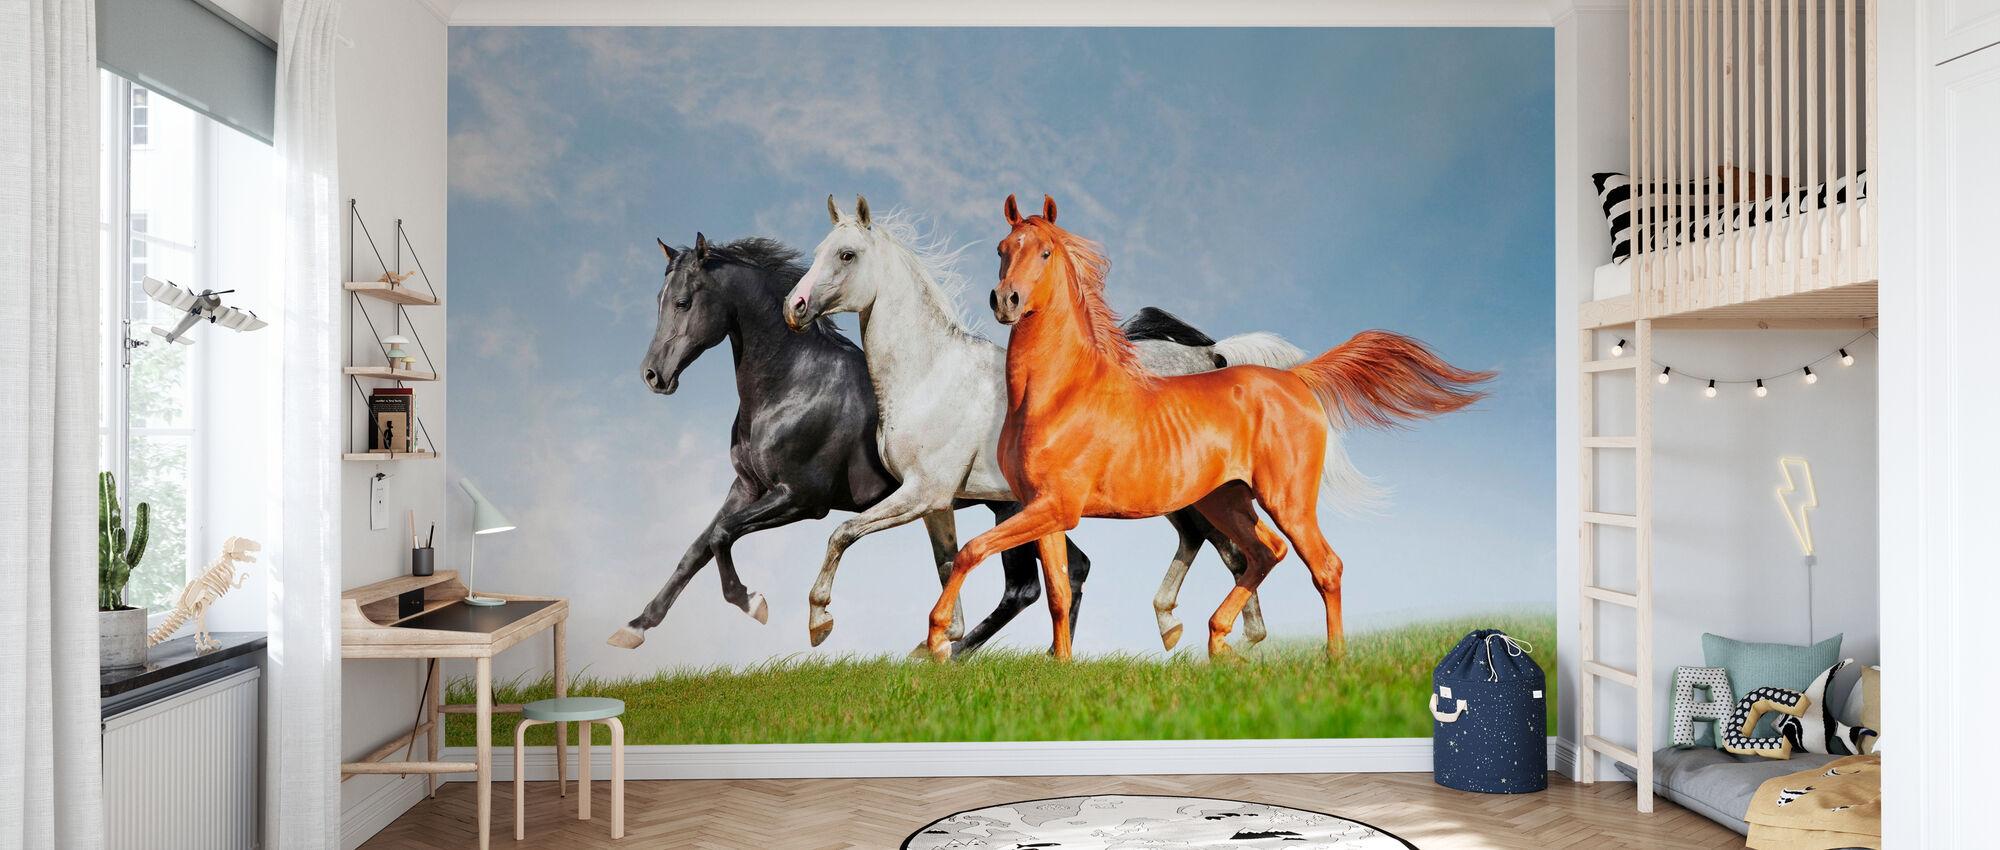 Arab Horses laufen frei - Tapete - Kinderzimmer